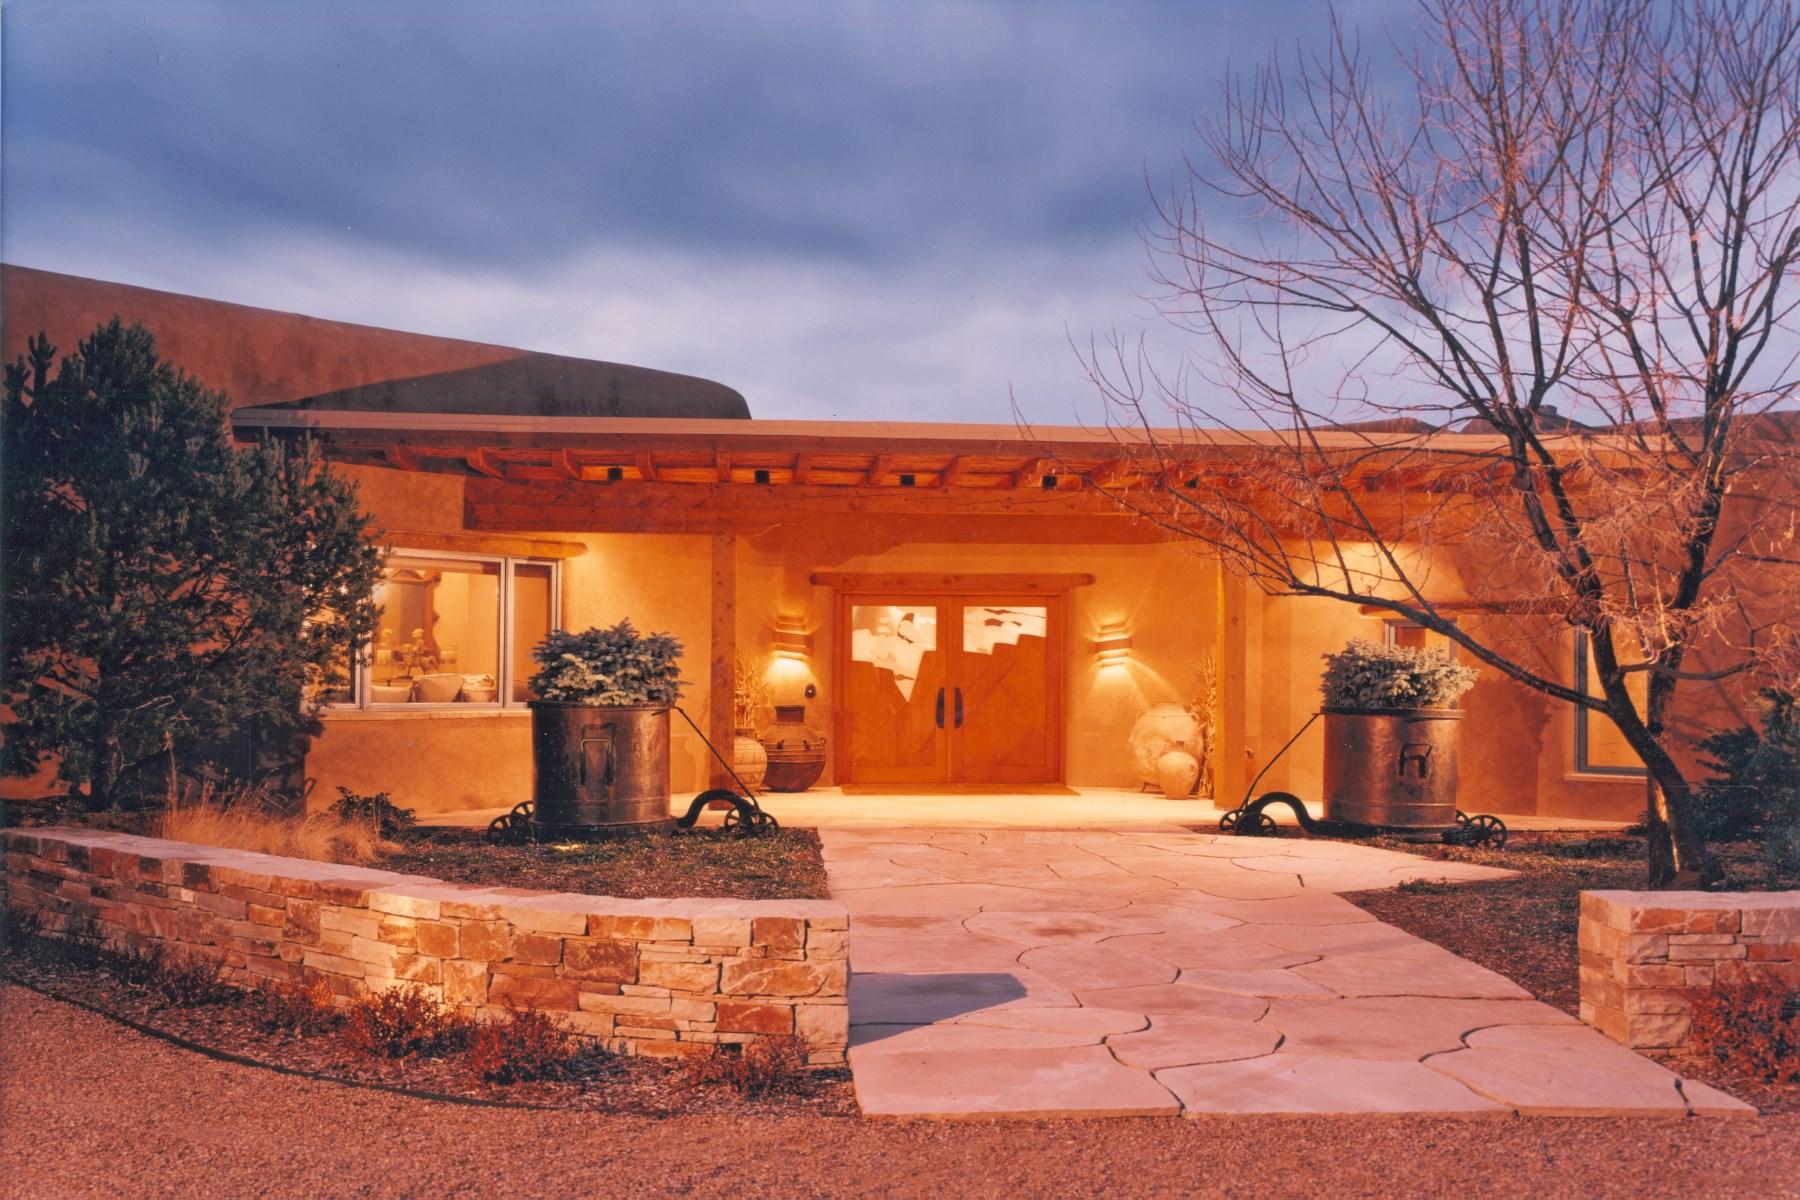 Single Family Home for Sale at 4 Camino Sabio Santa Fe, New Mexico 87574 United States